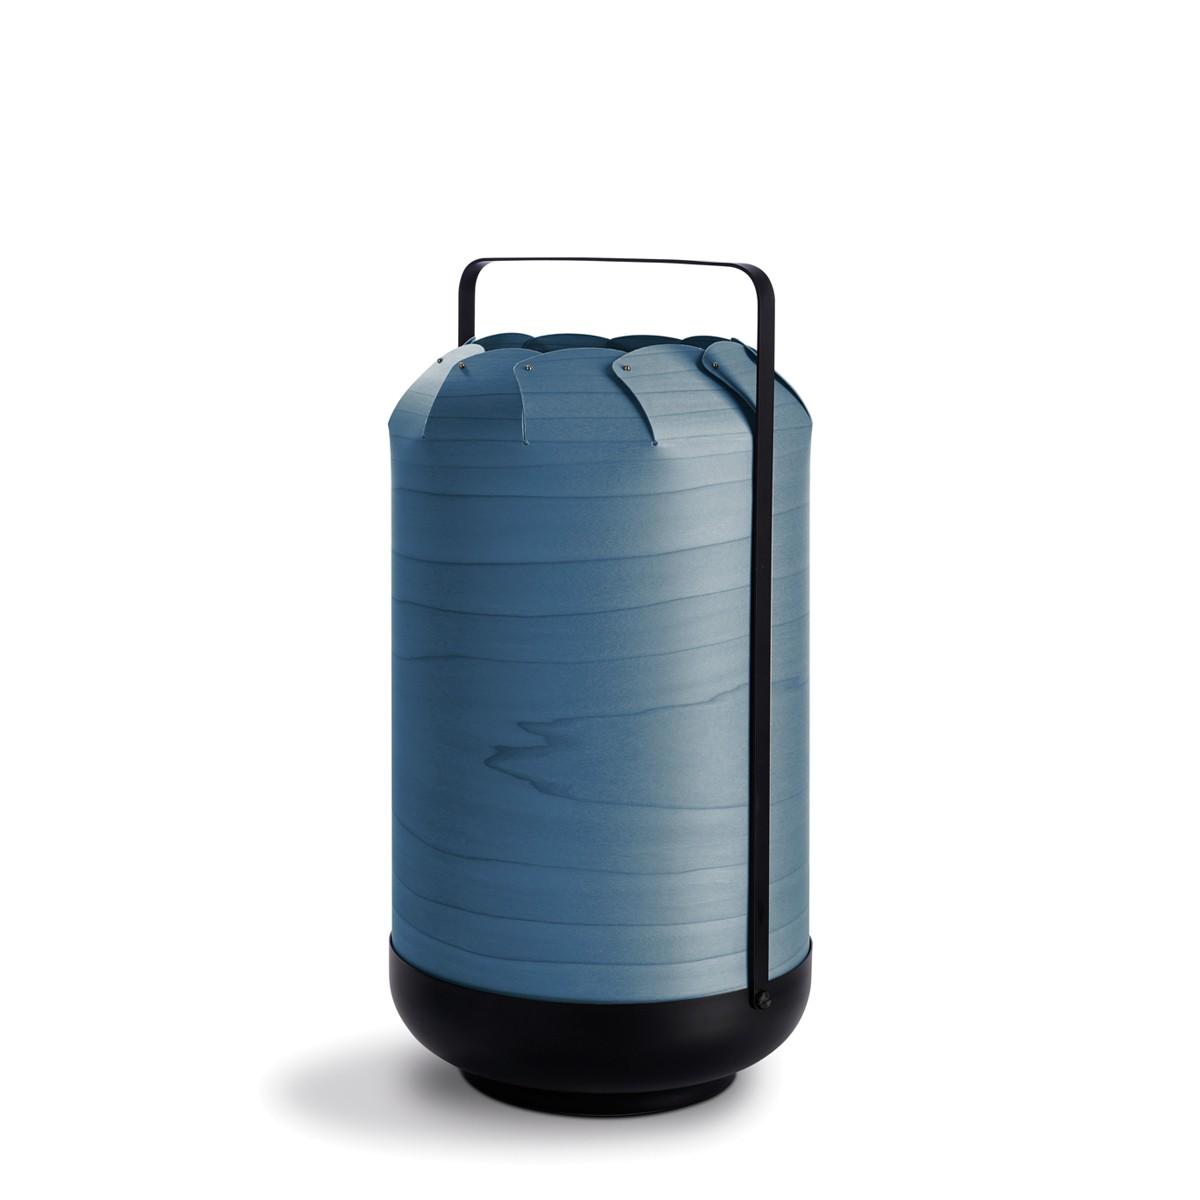 LZF Lamps Chou Tall Tischleuchte, blau